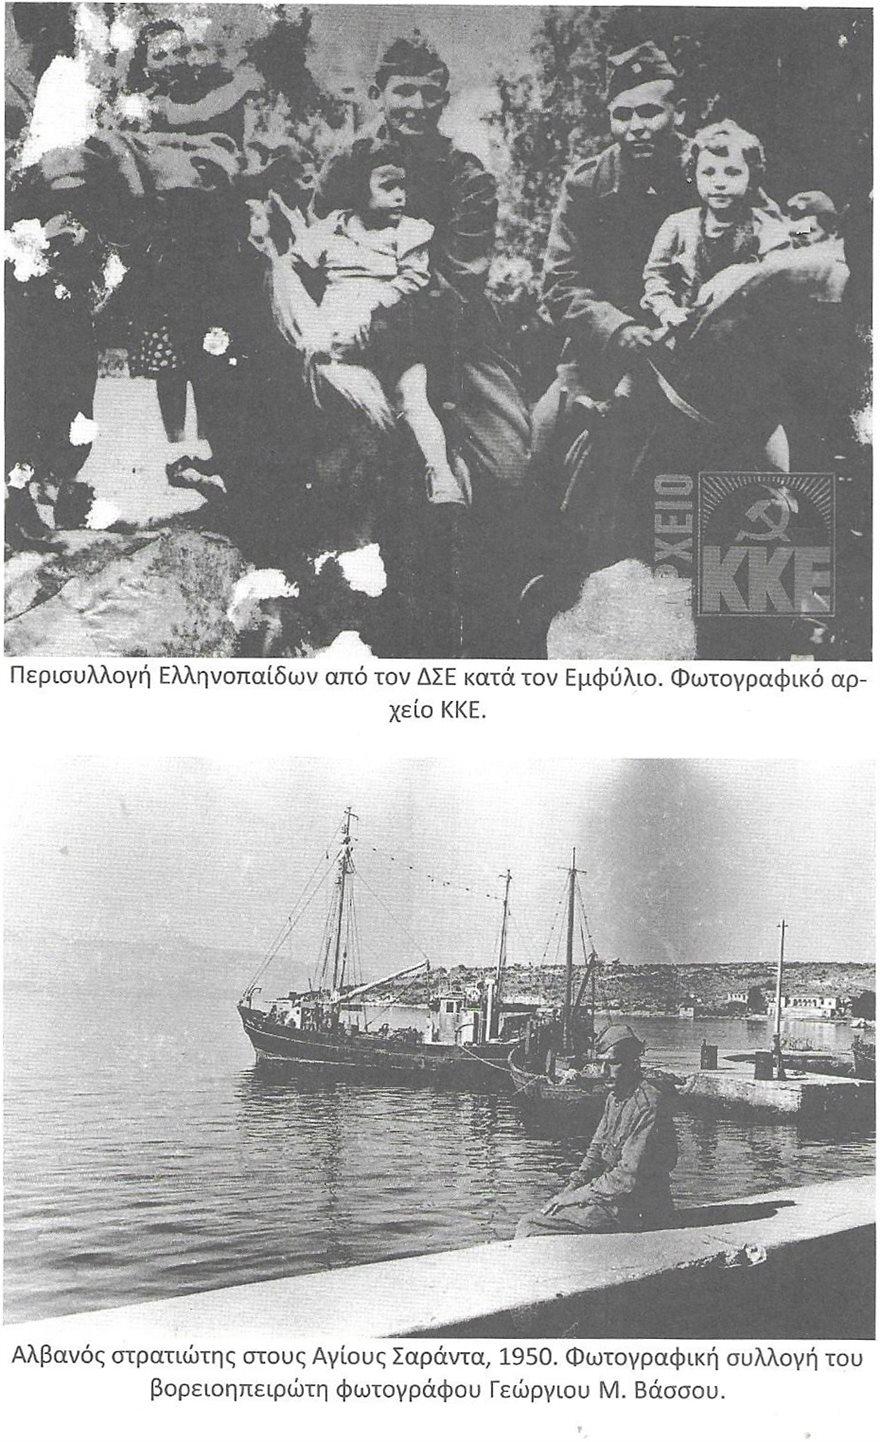 kke-albania-5